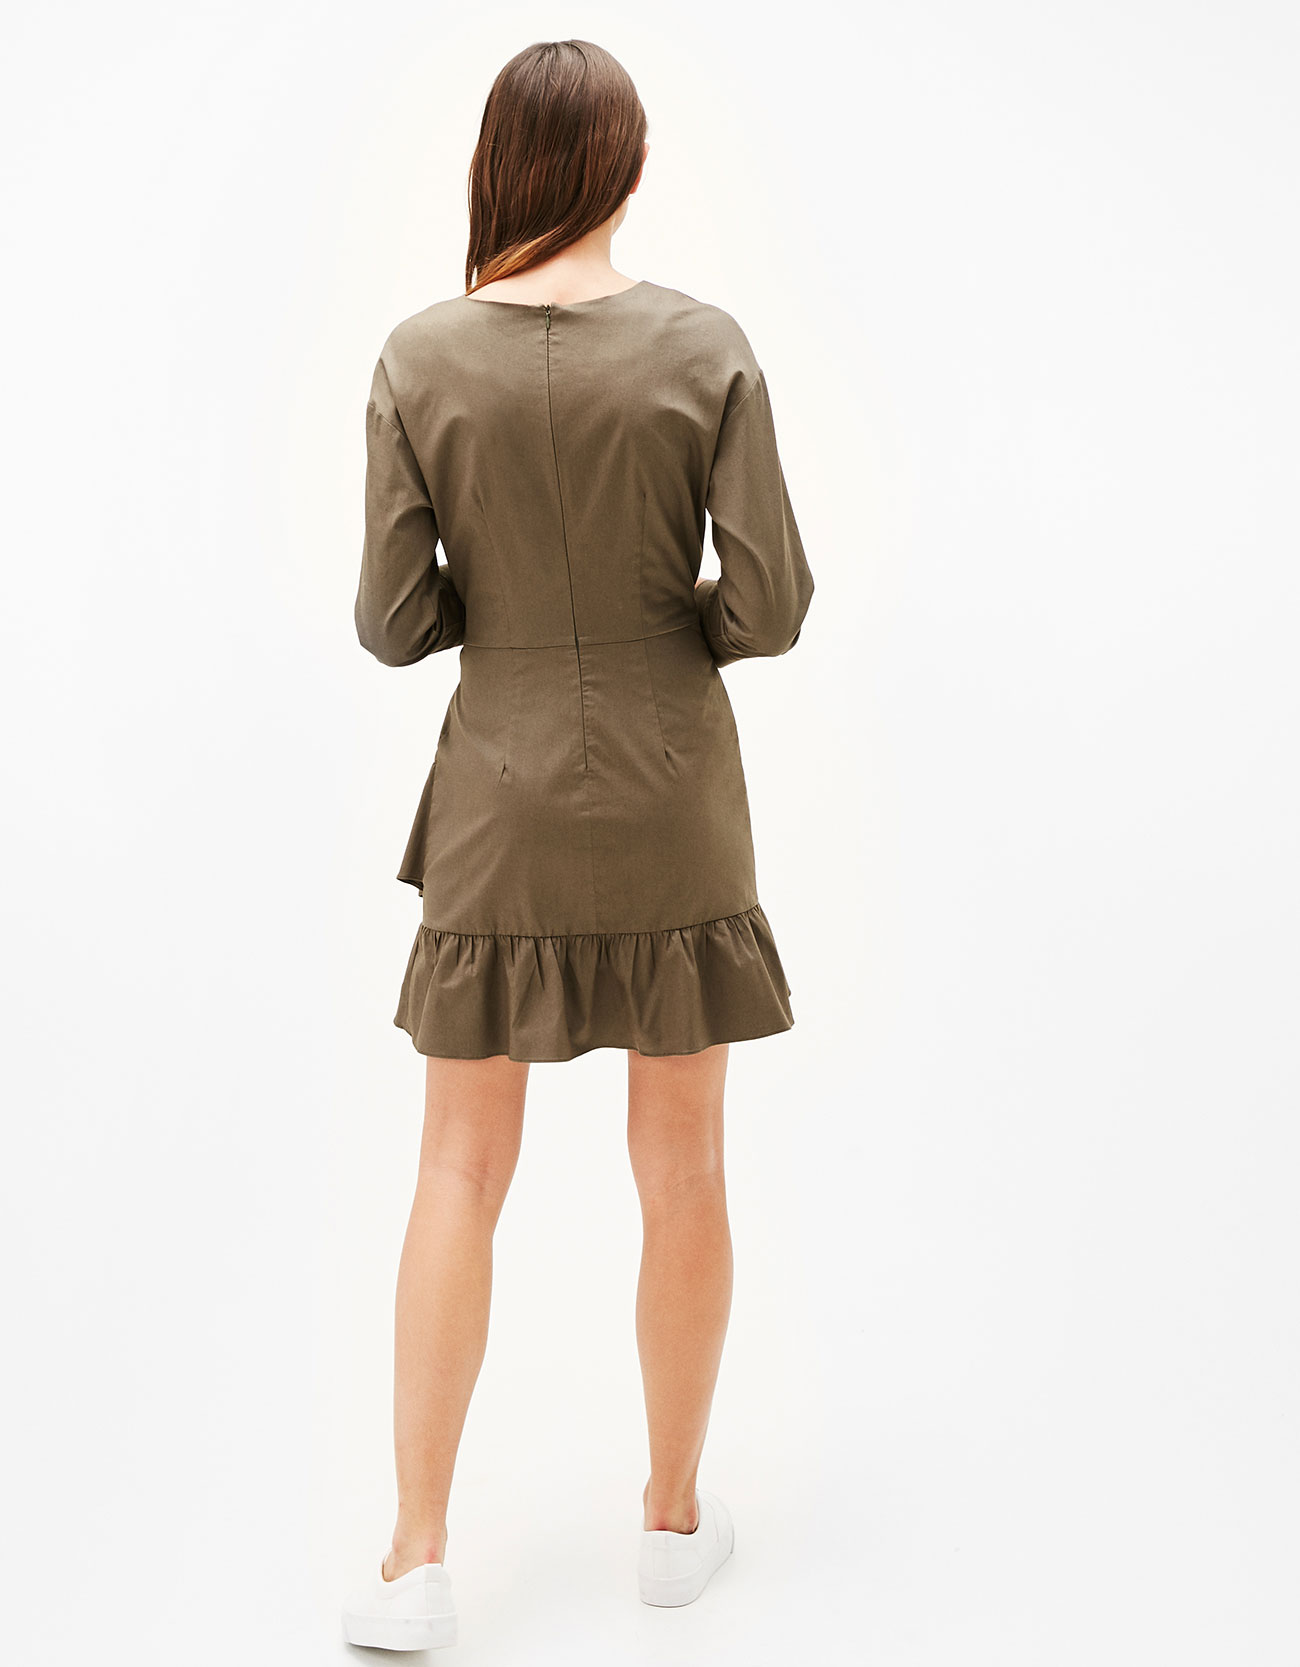 style a dress 0 3